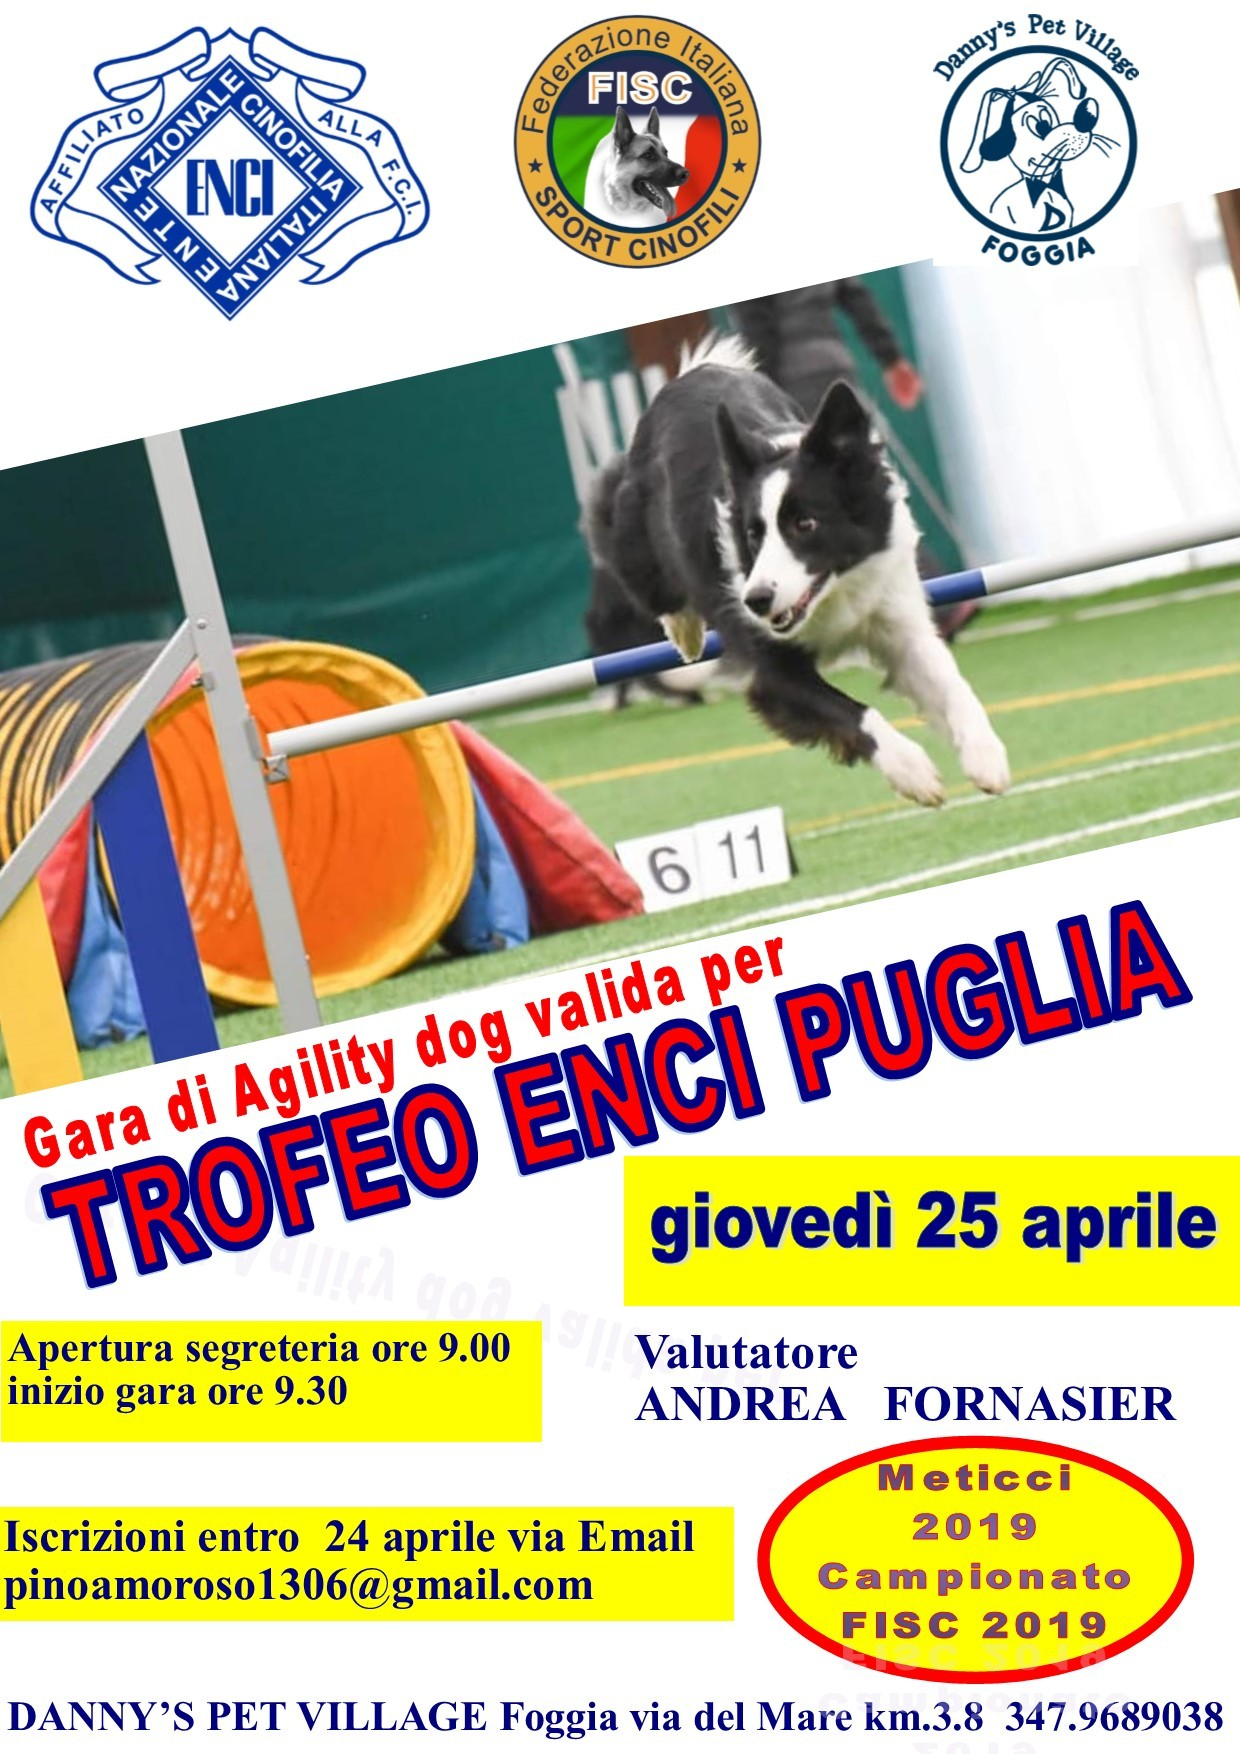 GARA DI AGILITY DOG TROFEO  ENCI PUGLIA